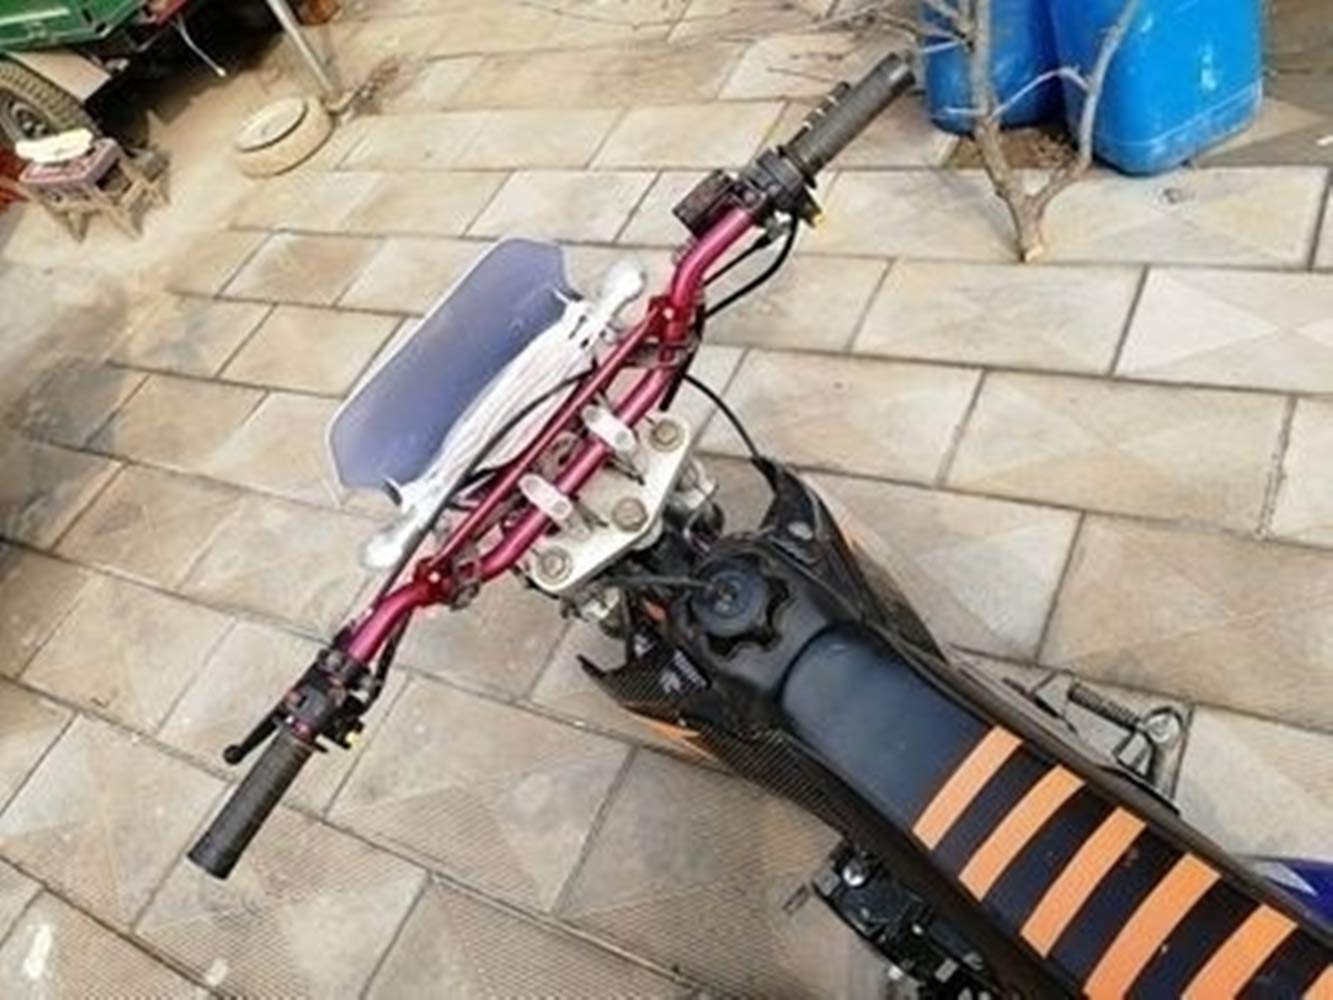 Schwarz 80 cm Mofa Quad Roller//Scooter Simson Moped f/ür Motorrad Motocross Lenker Flach mit Strebe